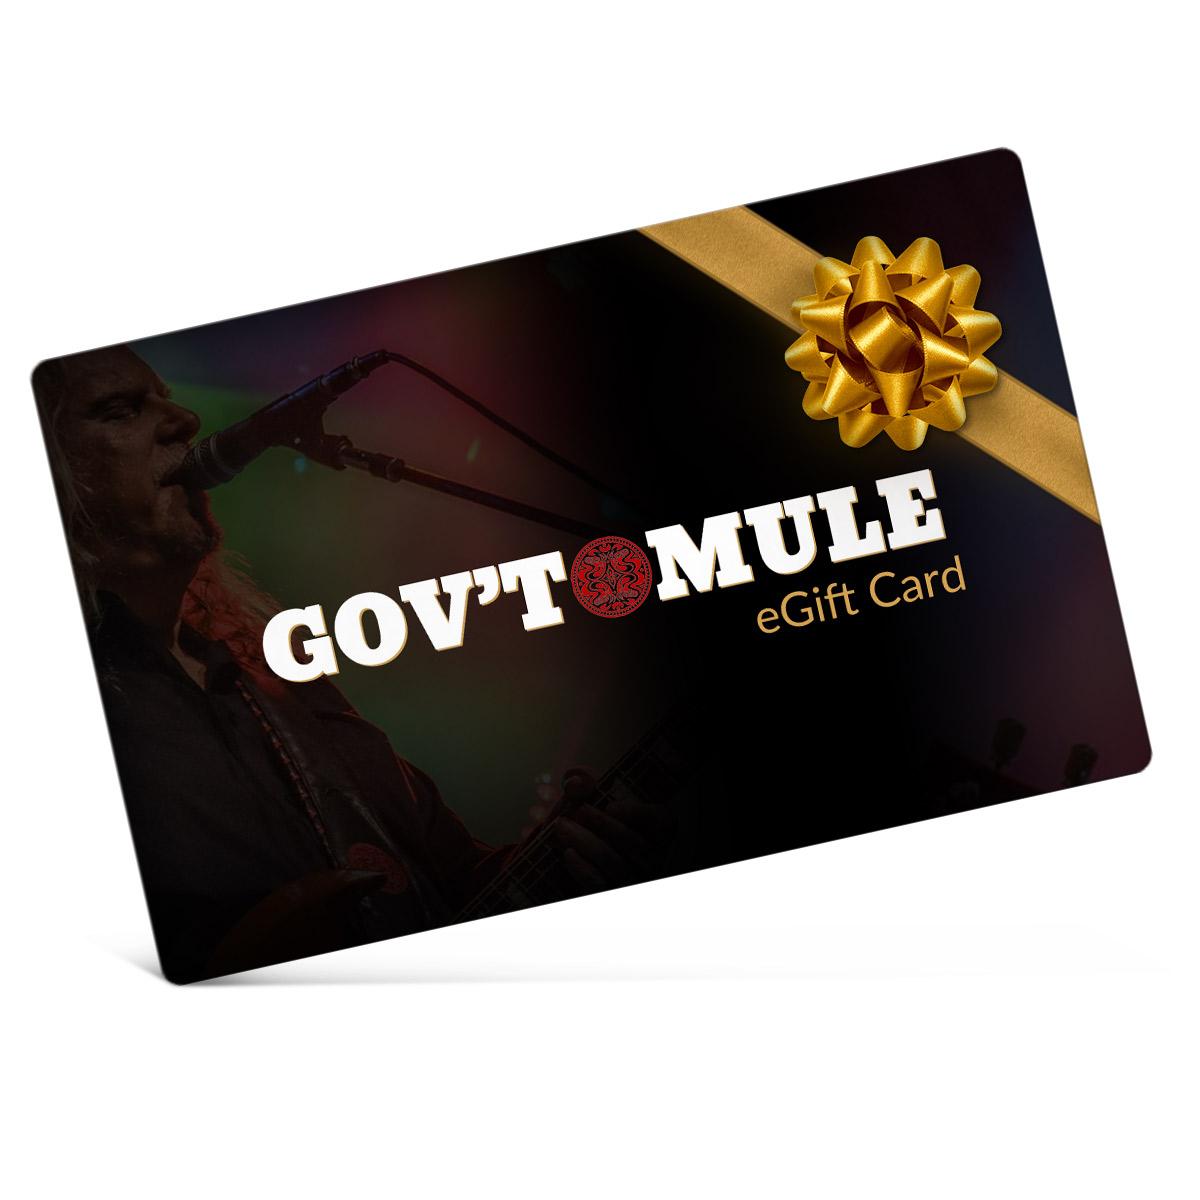 Gov't Mule eGift Card